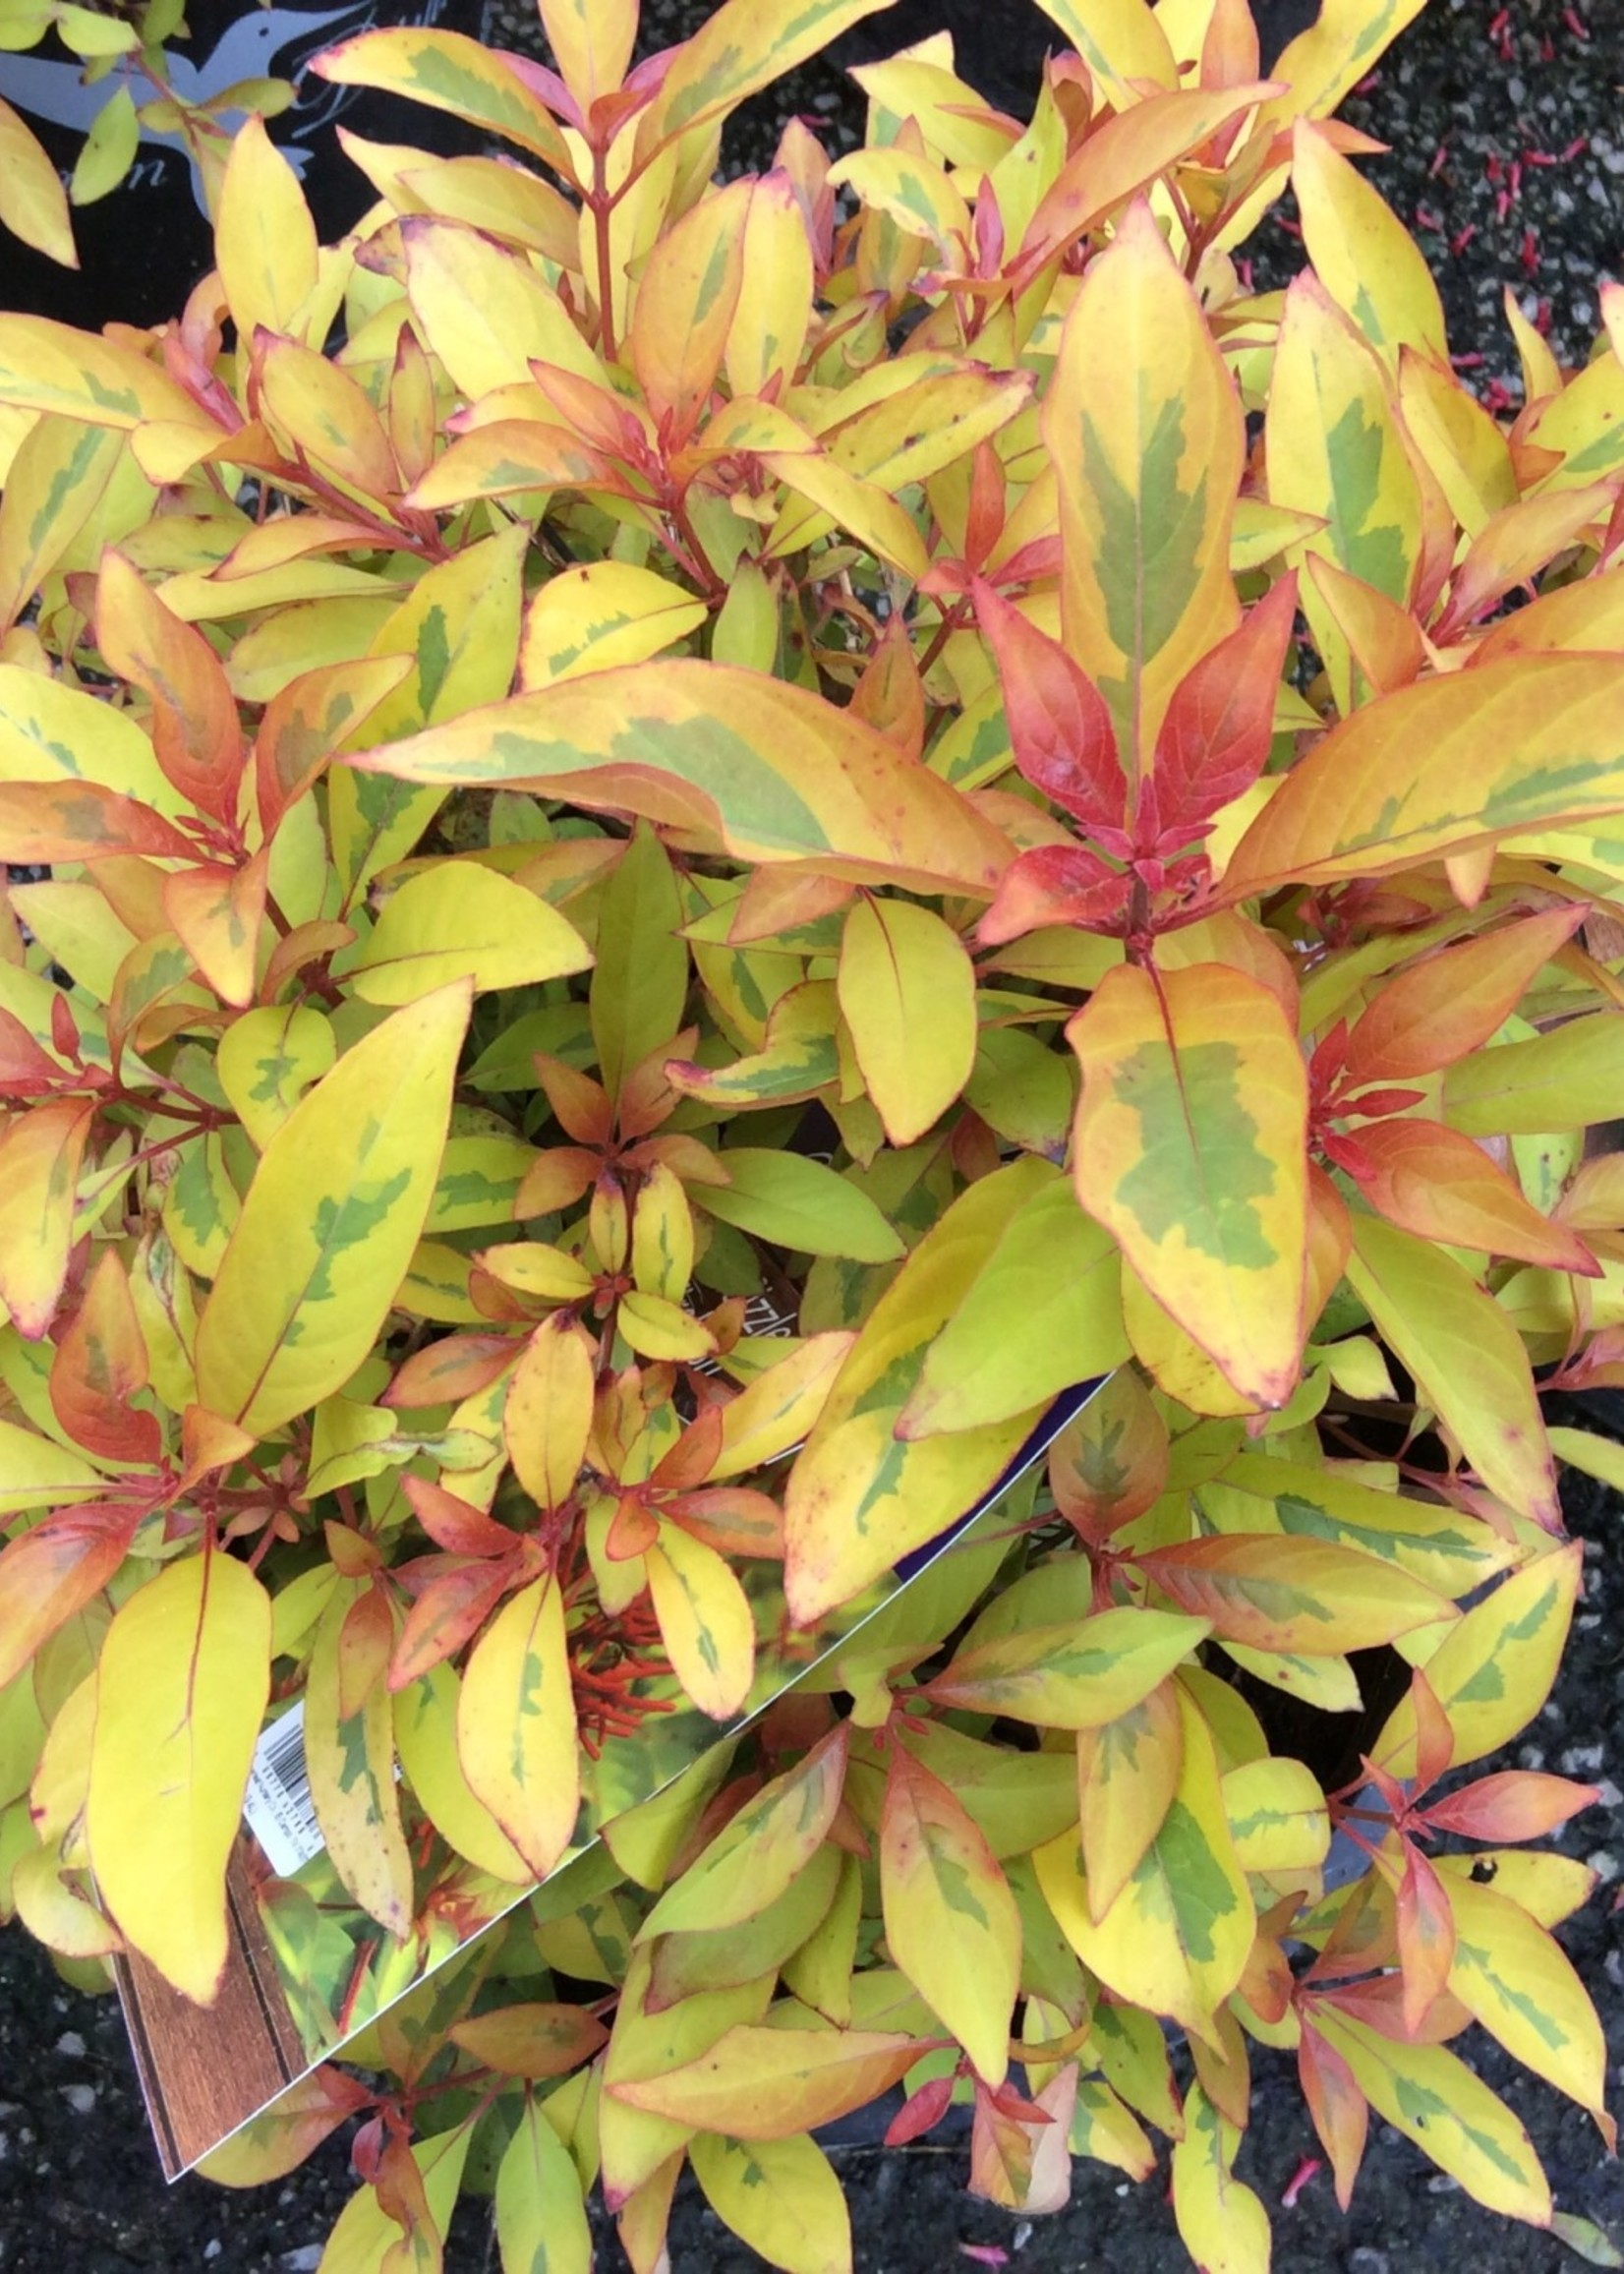 Hummingbird Bush, 'Lime Sizzler' 3G